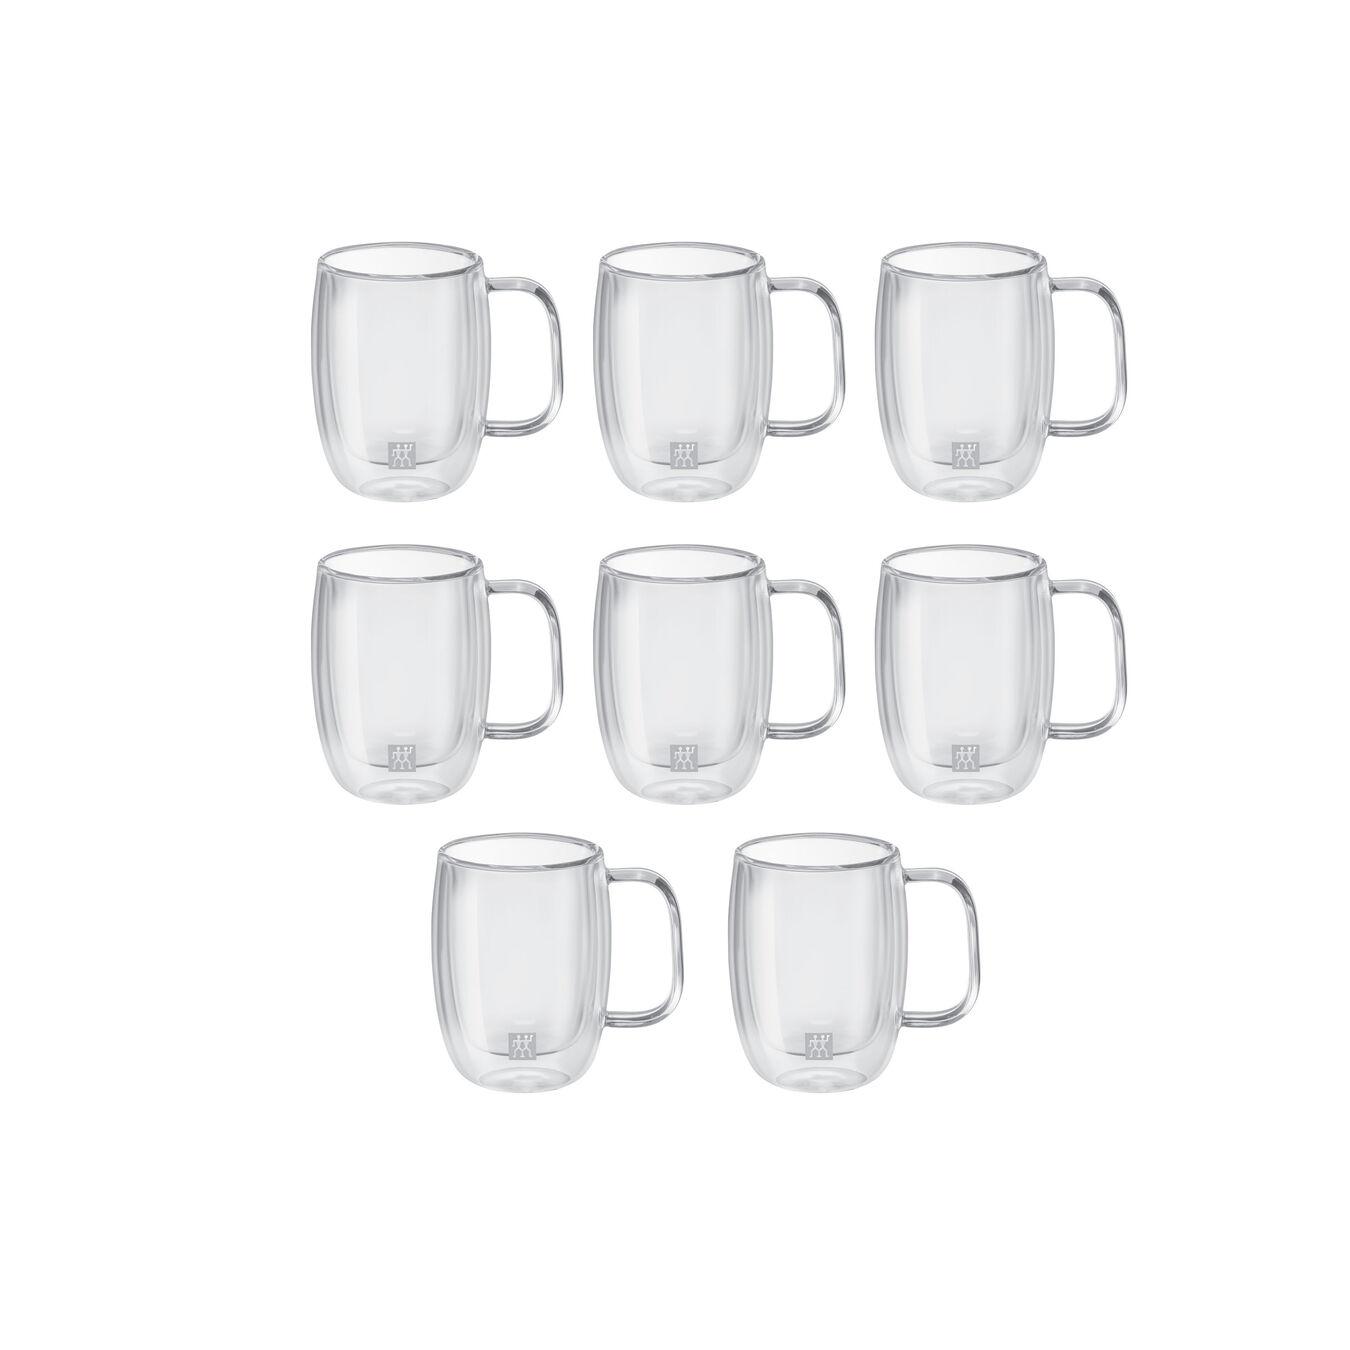 8 Piece Double Espresso Mug Set - Value Pack,,large 1